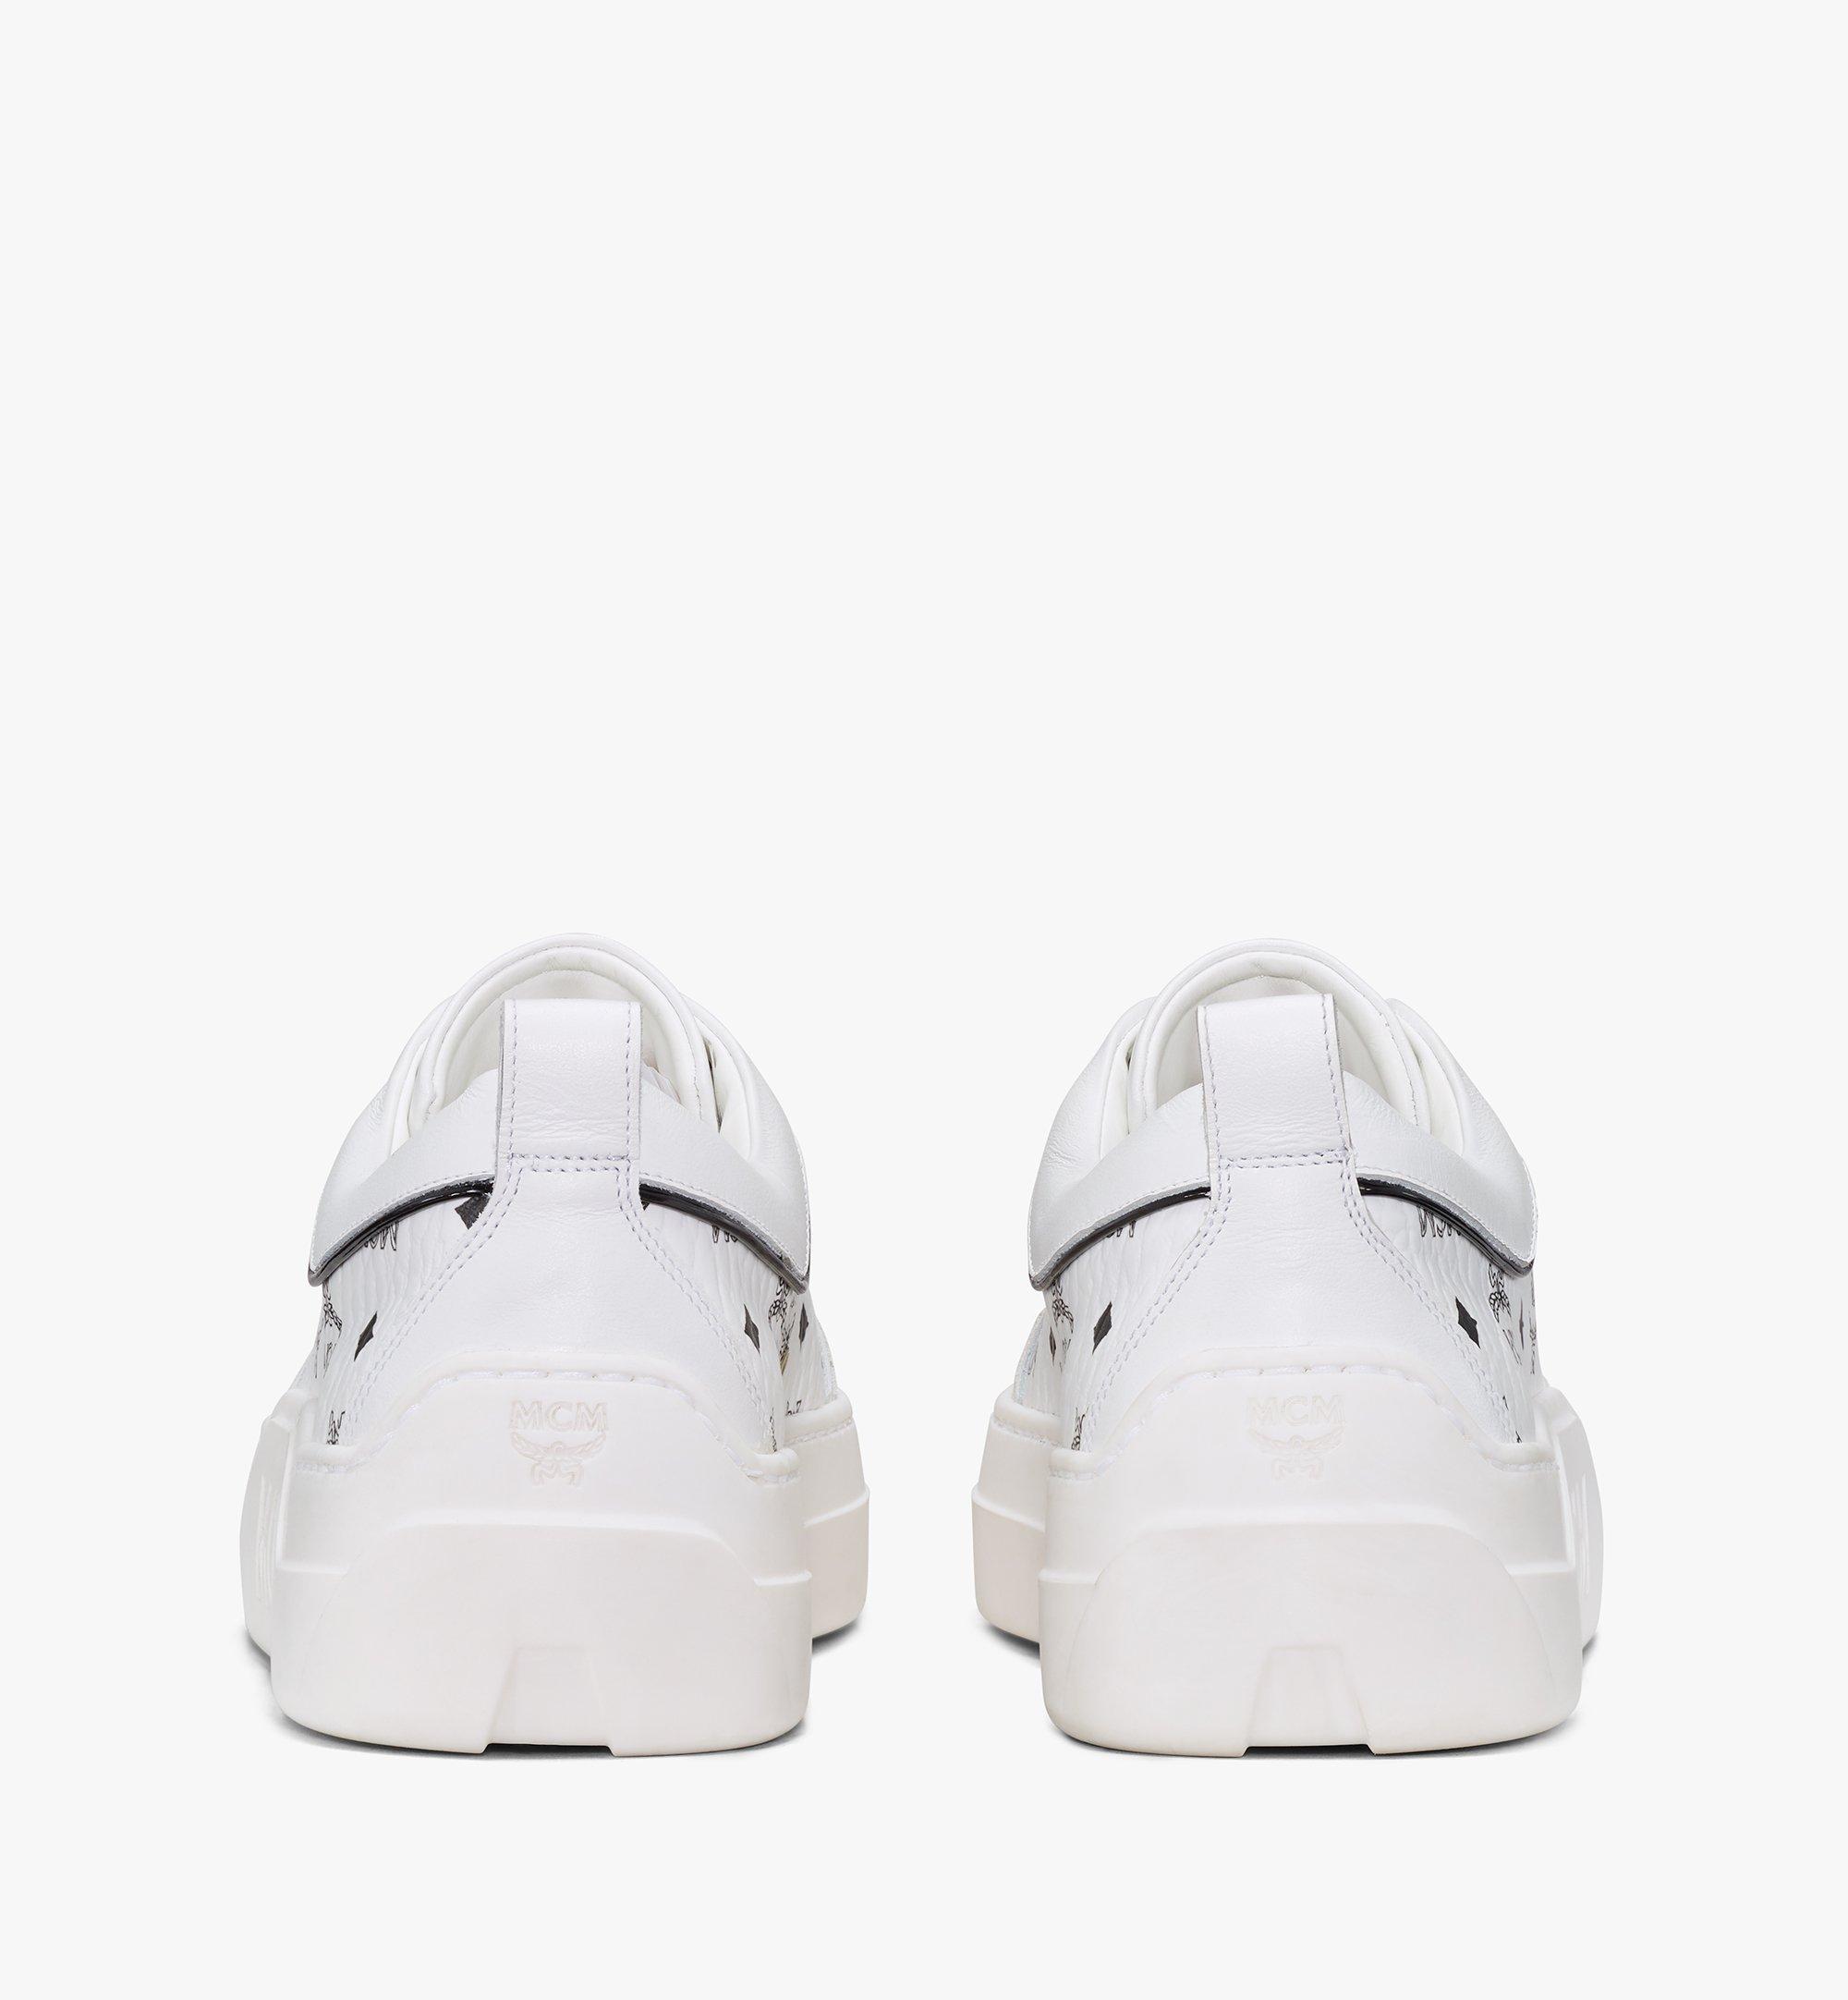 MCM 女士Skyward Visetos厚底运动鞋 White MESAAMM19WT035 更多视角 2